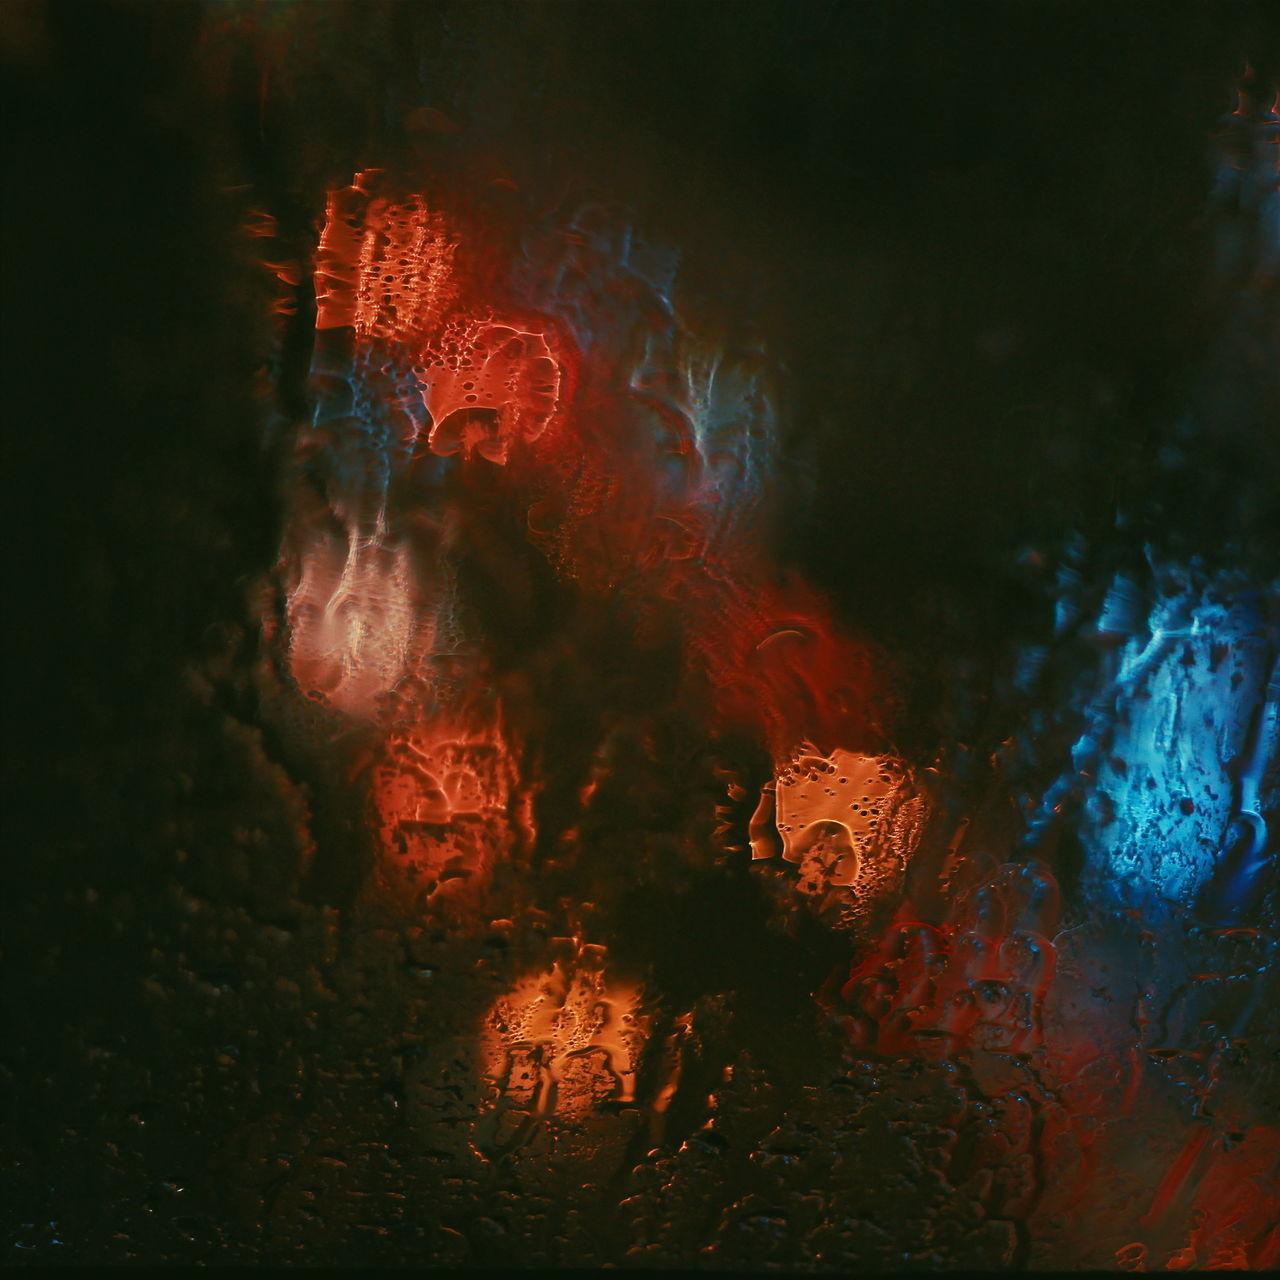 glowing, burning, flame, night, no people, heat - temperature, motion, close-up, illuminated, indoors, bonfire, nature